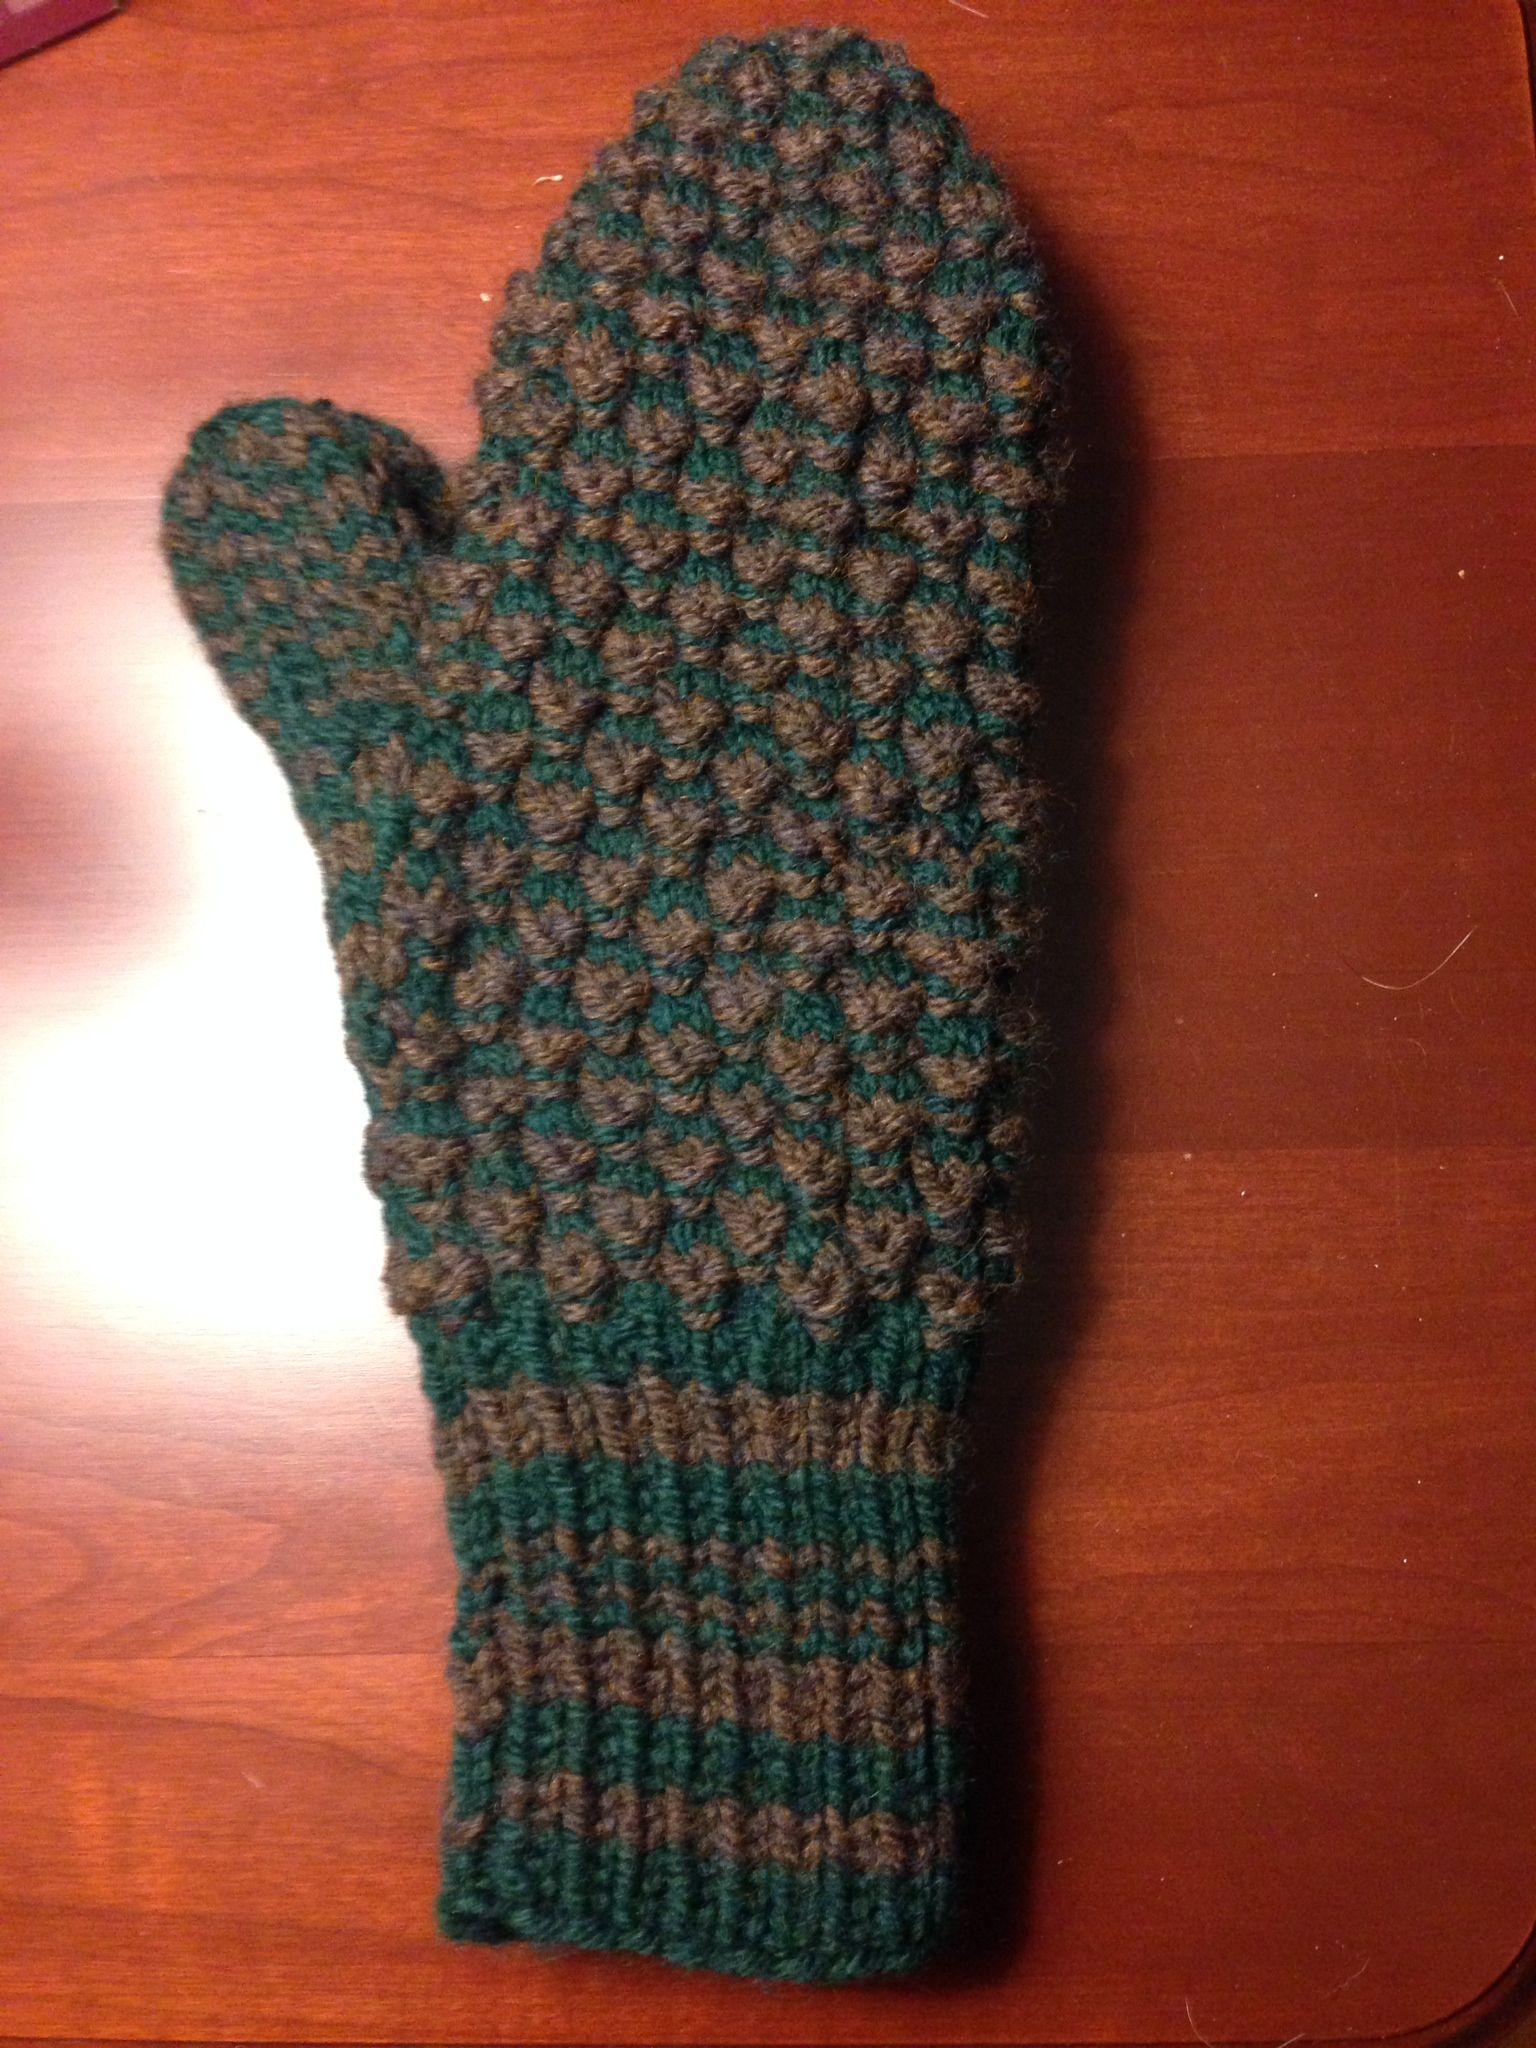 Pin von Cheryl Junkins auf Knitting and crocheting I\'ve done | Pinterest